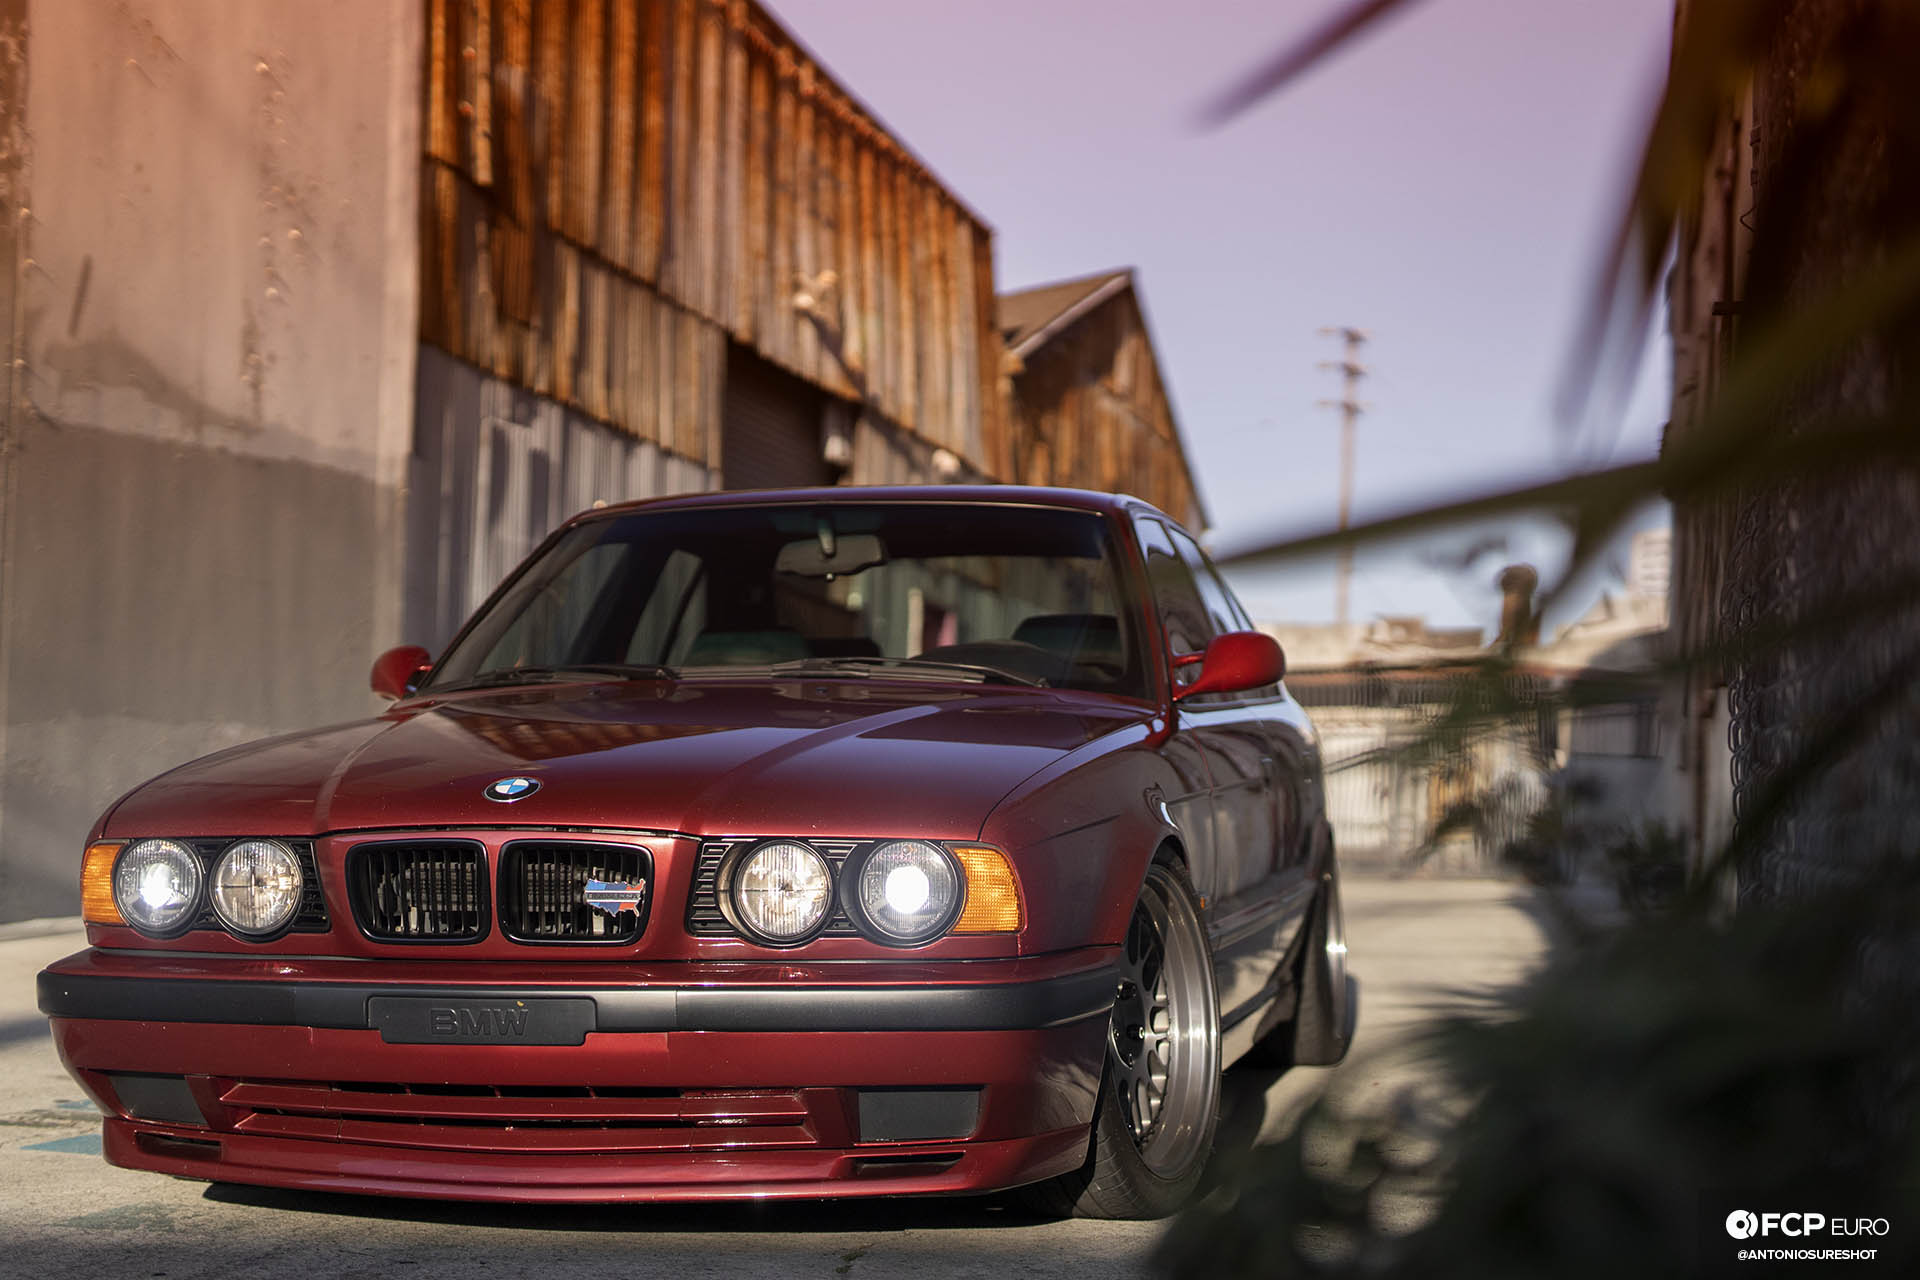 E34 BMW 540i M-Sport Rotiform Ground Control Eibach Koni